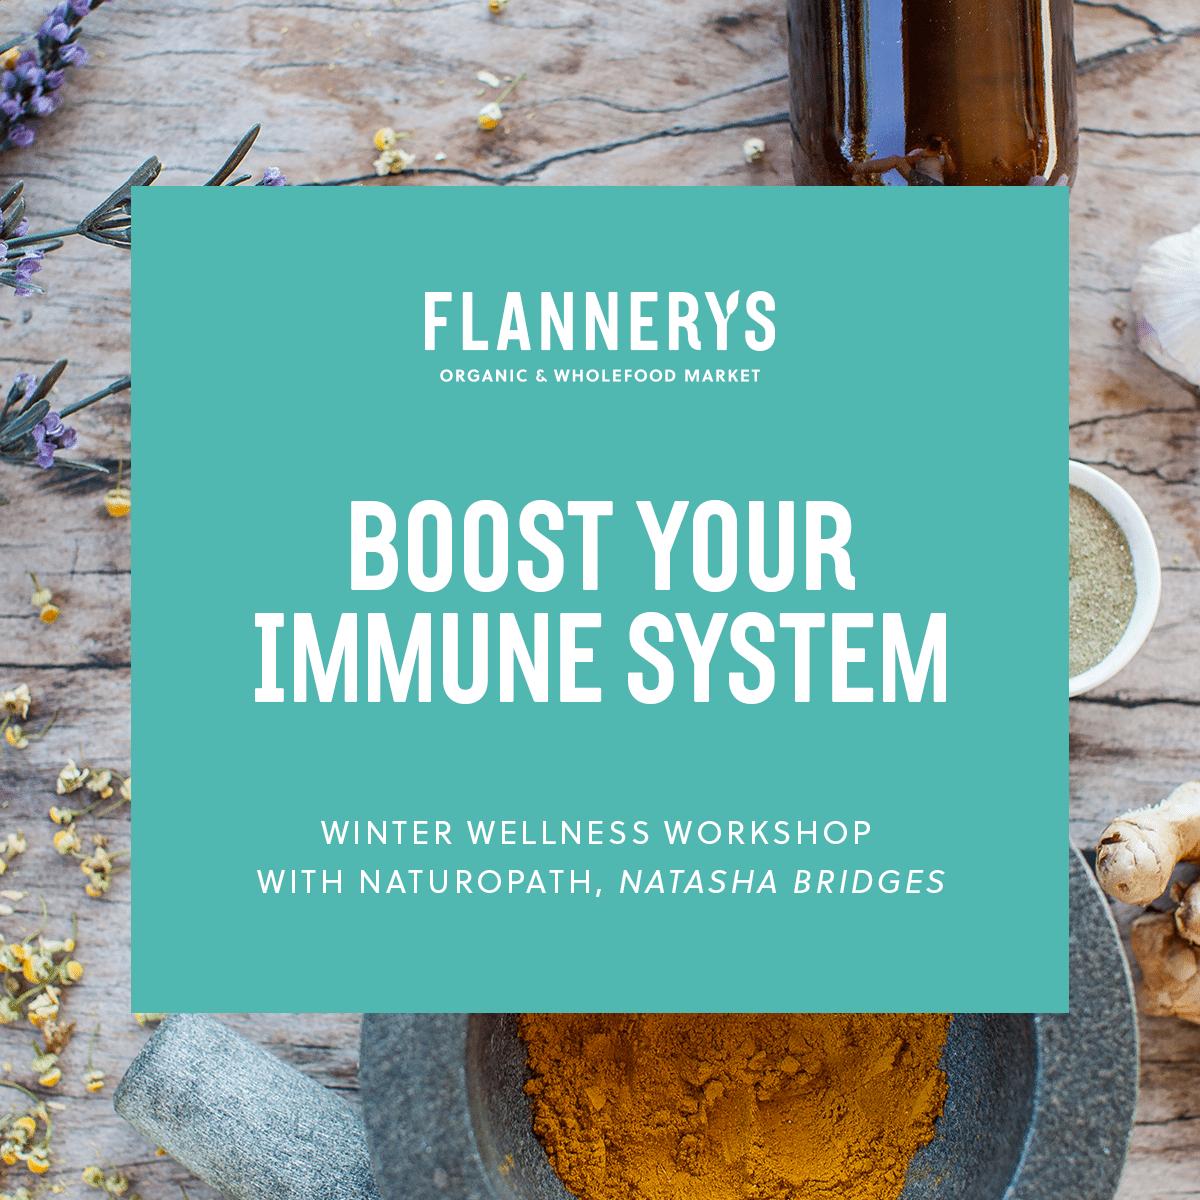 Winter Wellness Workshop – Boost Your Immune System